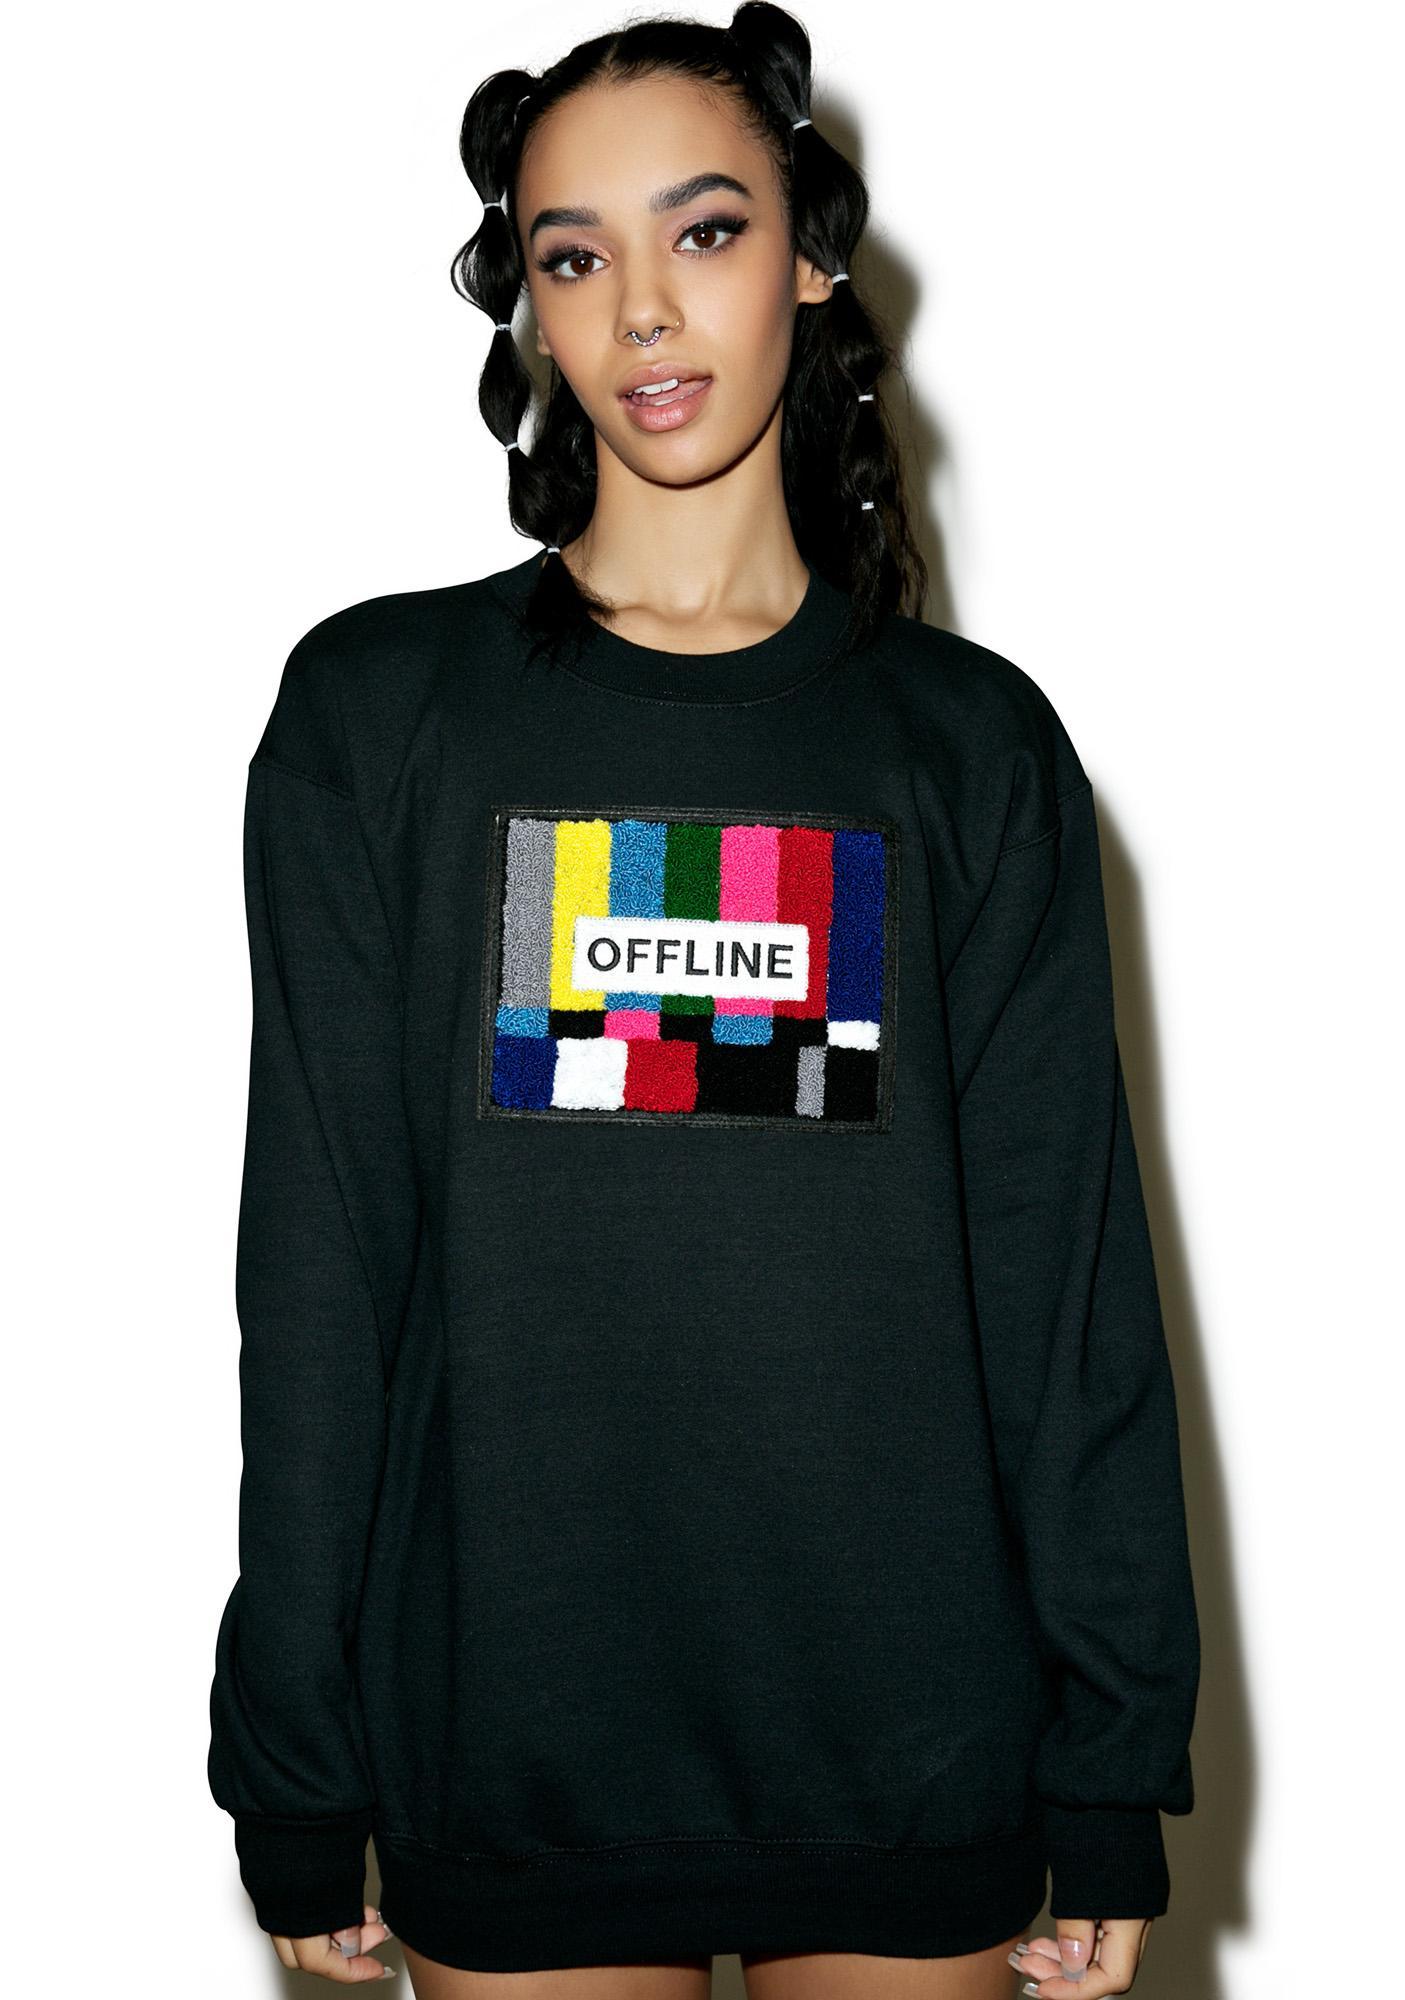 96c52c68e0dea Petals and Peacocks Offline Sweatshirt